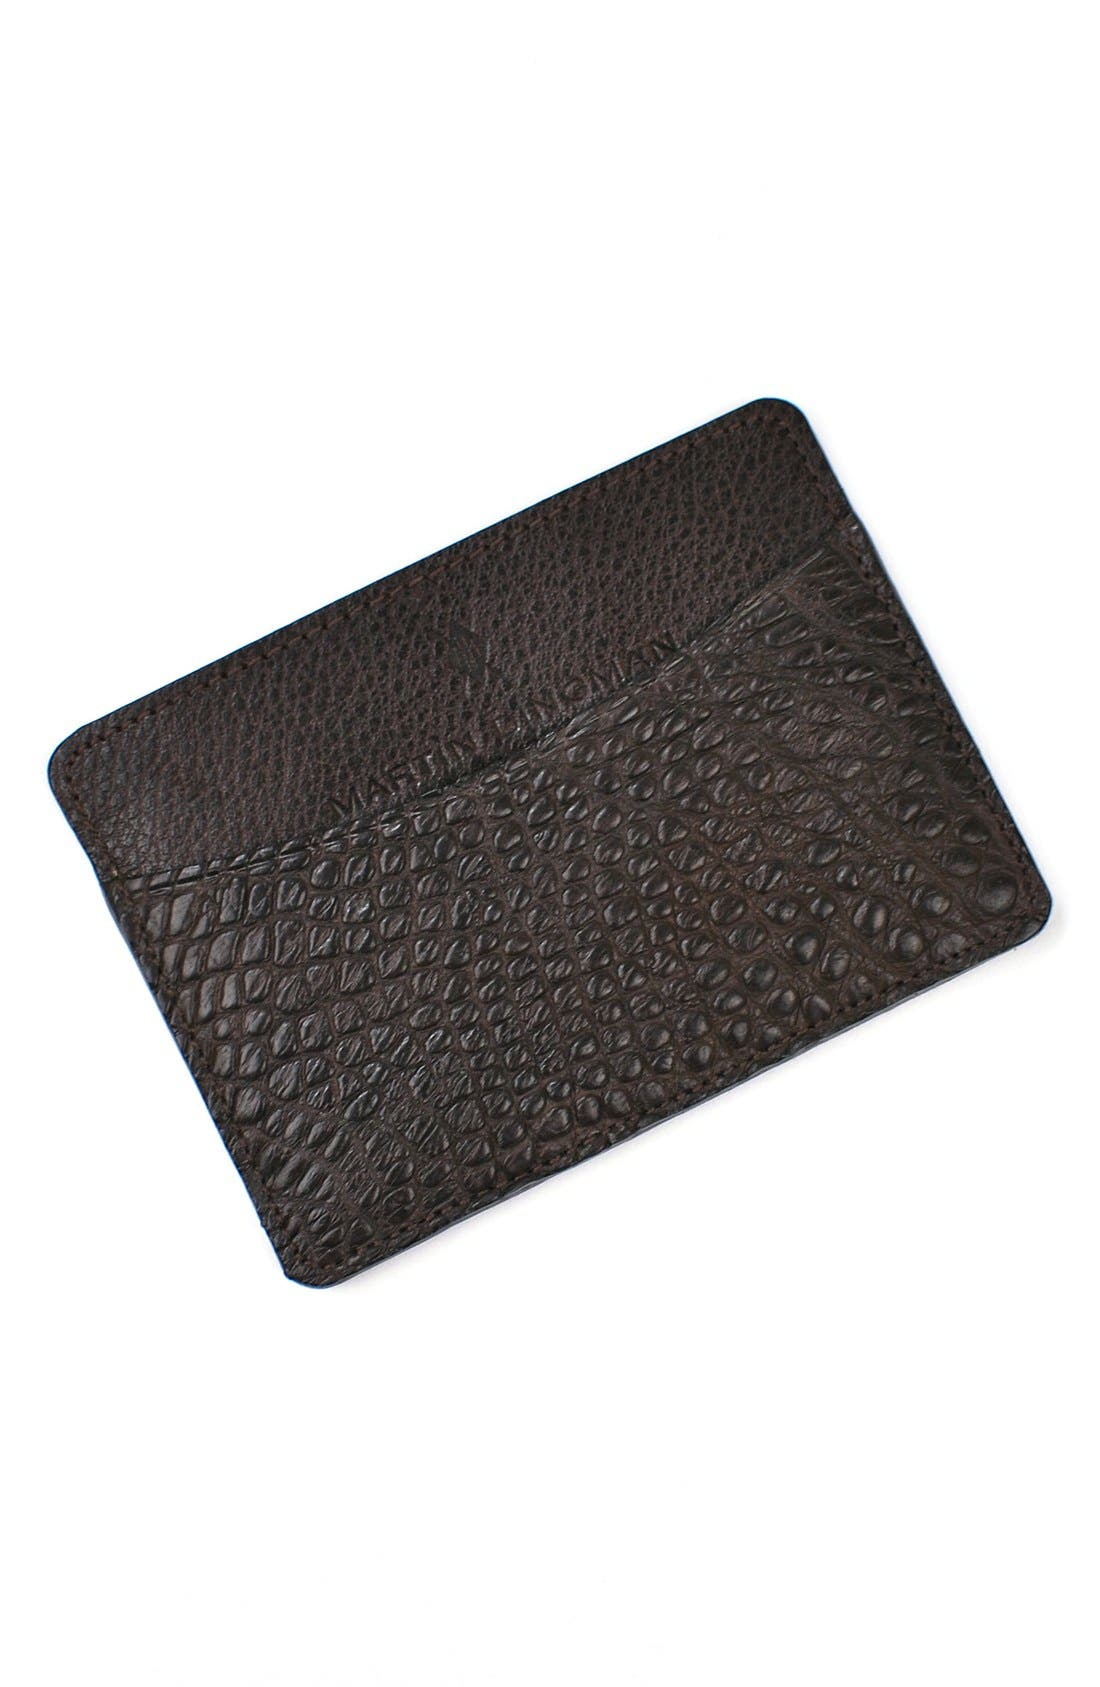 'Jameson' Matte Finish Genuine Alligator Leather Card Case,                             Main thumbnail 1, color,                             WALNUT